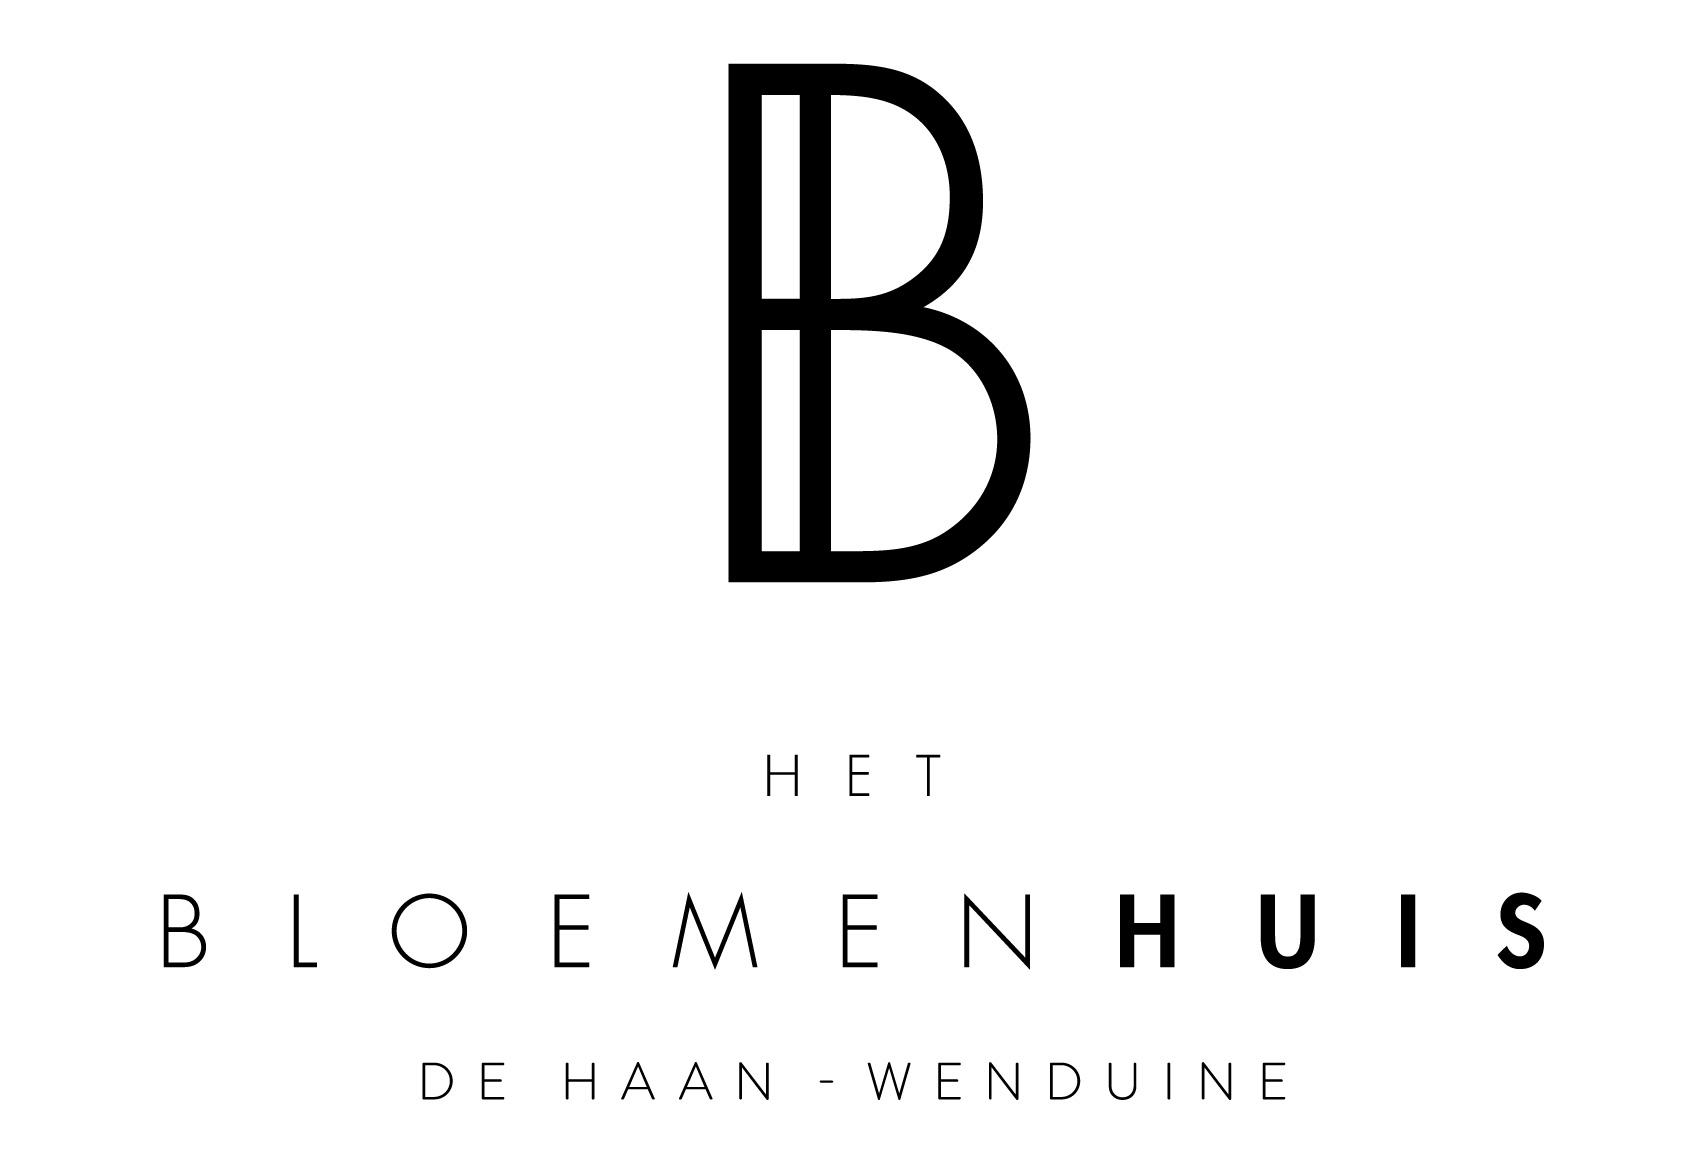 bloemenhuis-logo-header